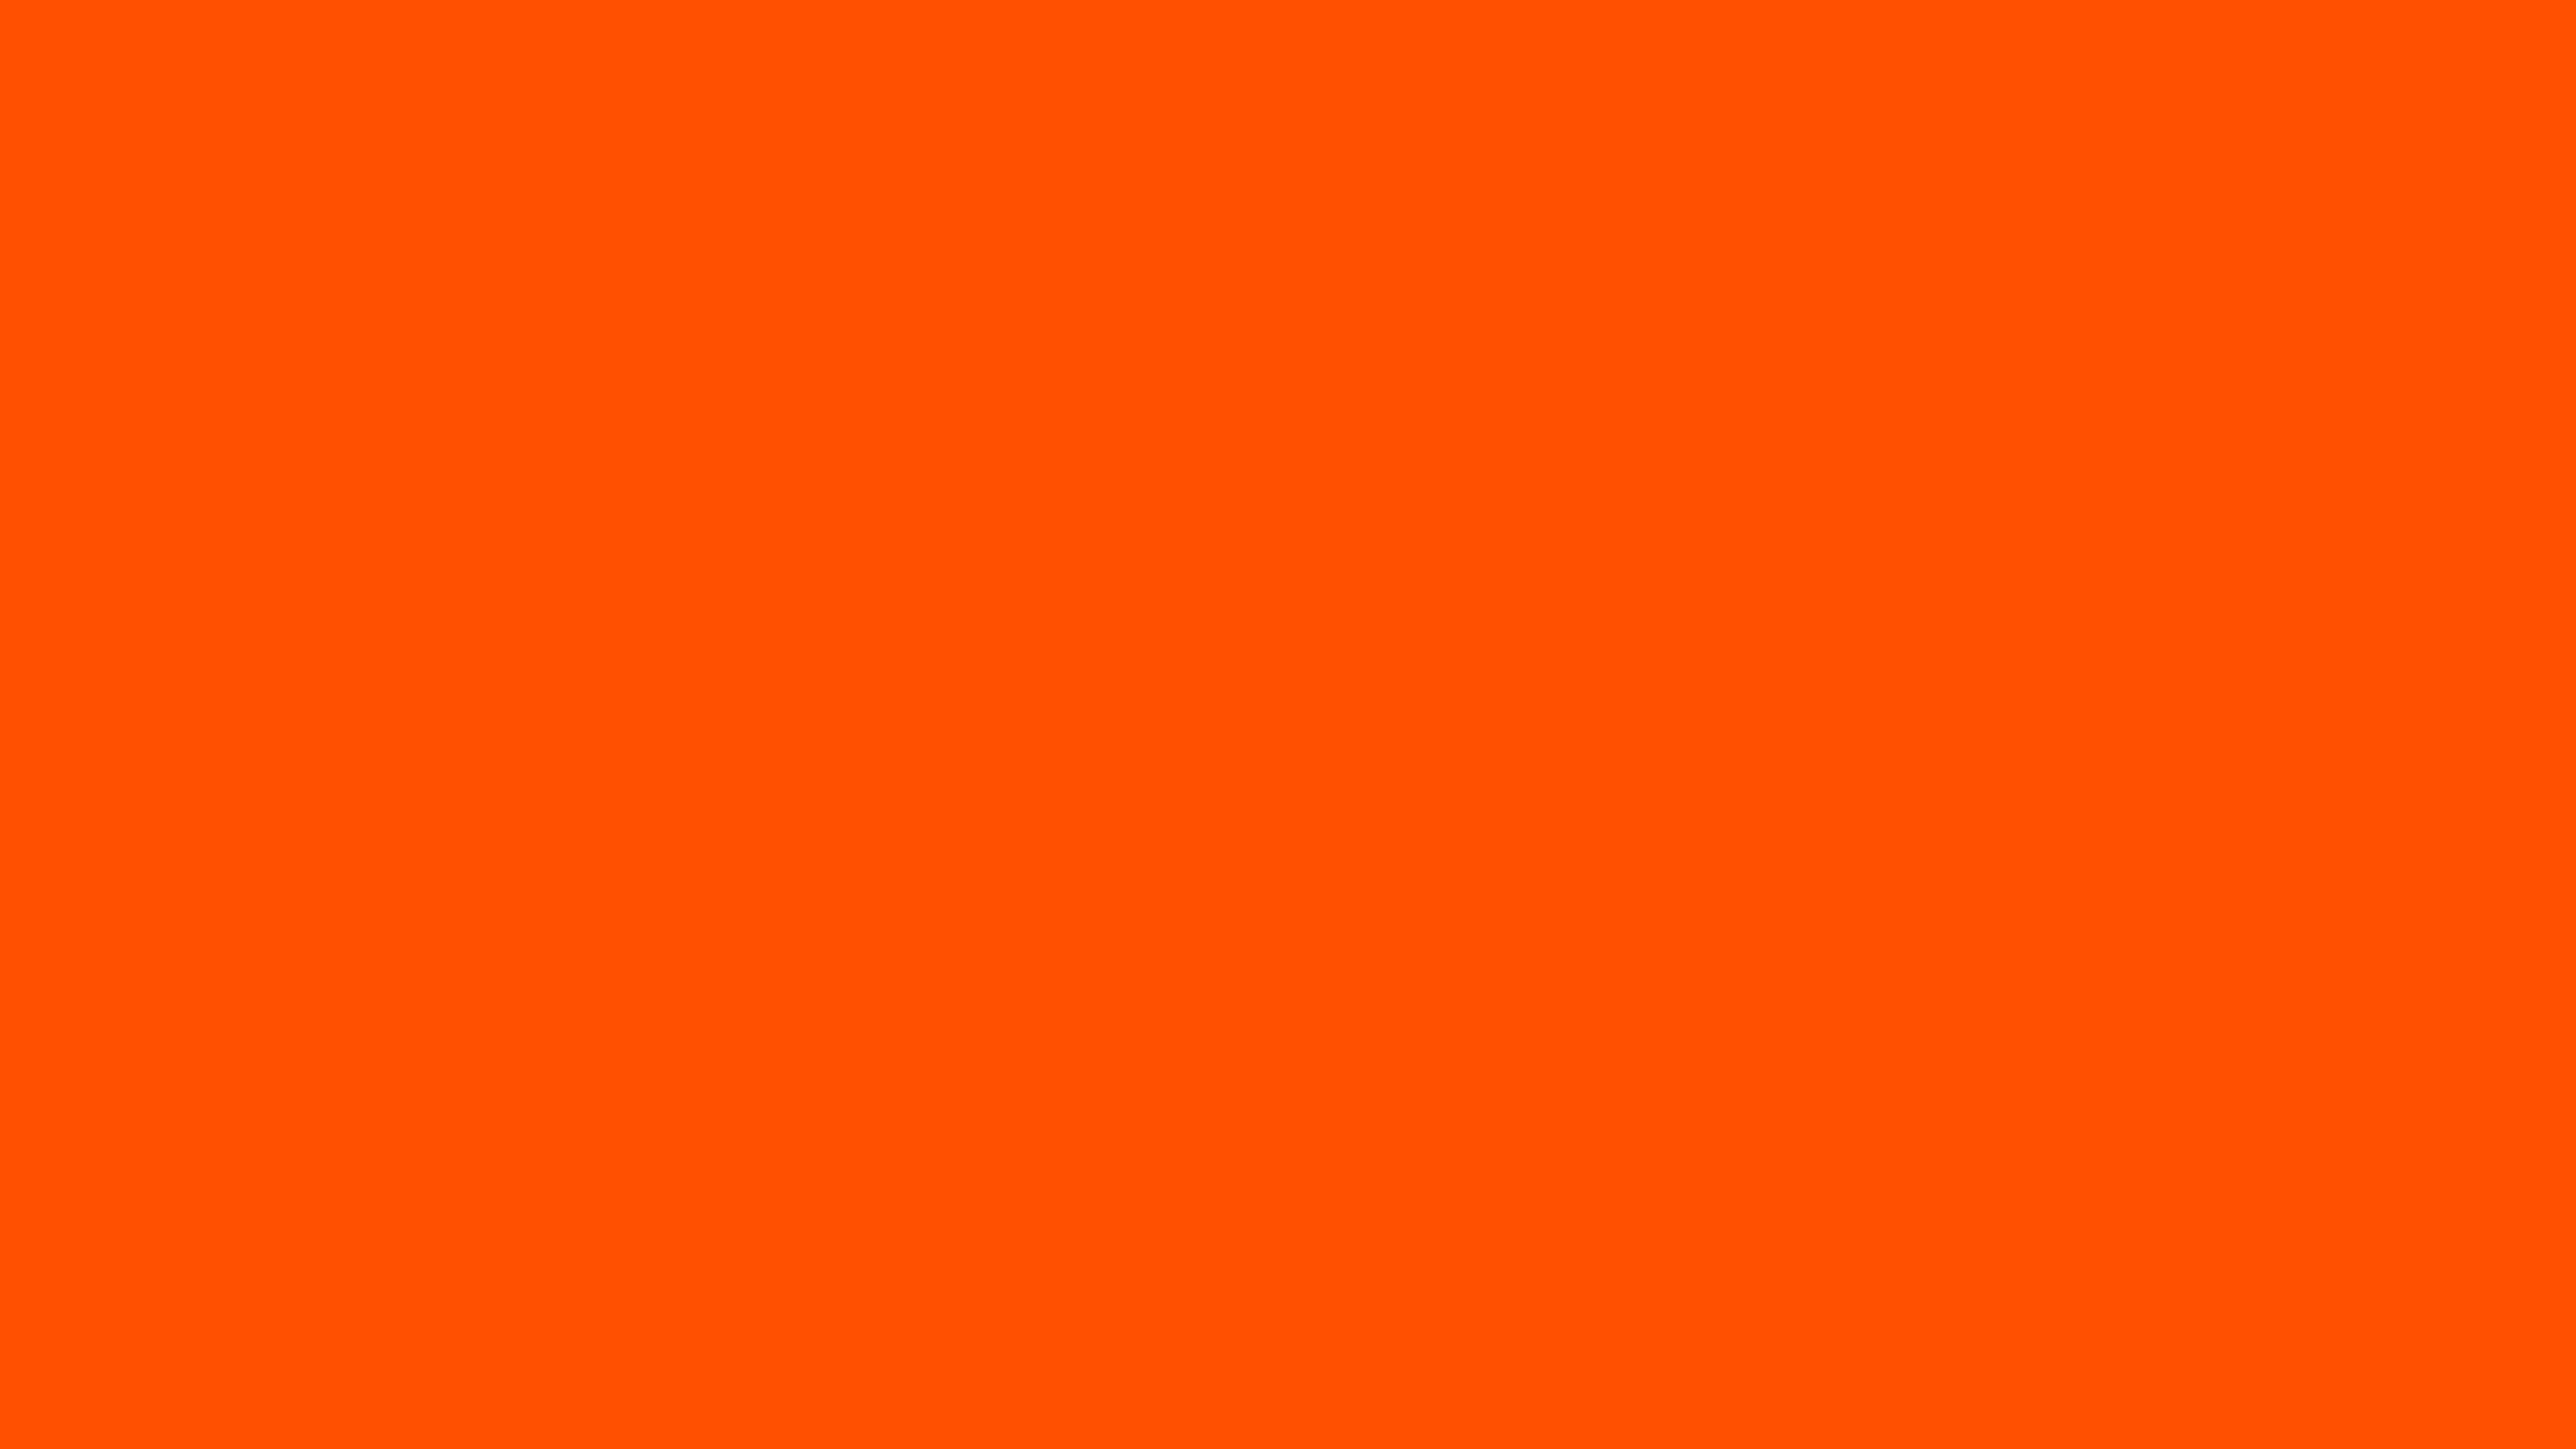 3840x2160 International Orange Aerospace Solid Color Background